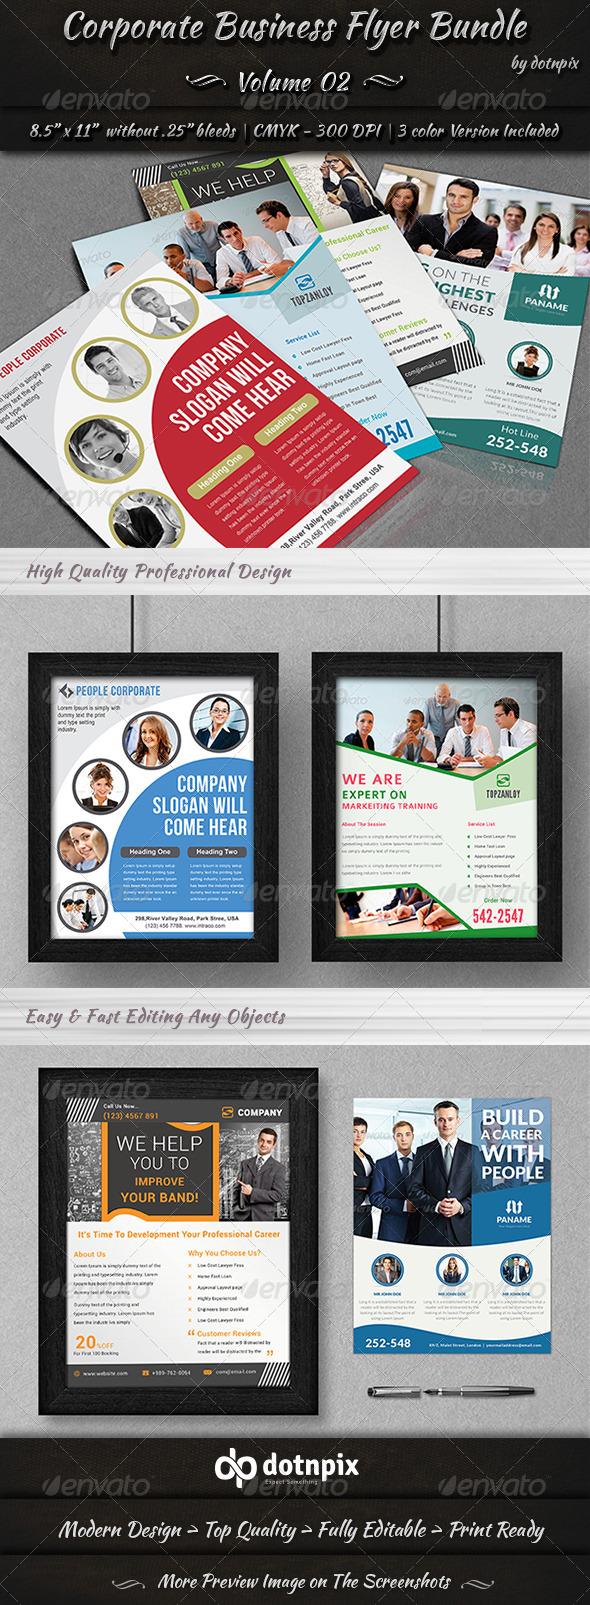 Corporate Business Flyer Bundle Volume 2